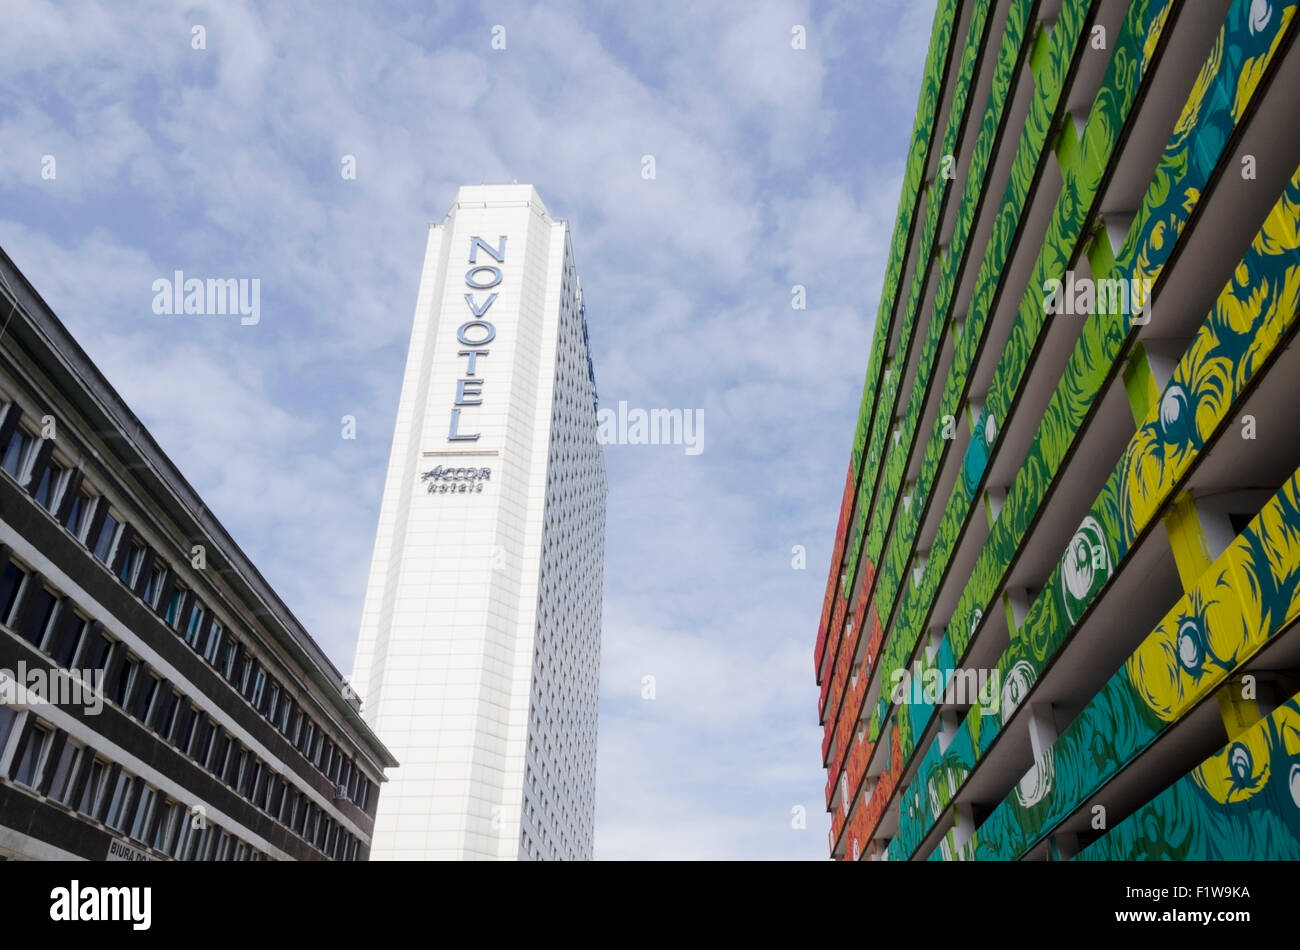 Novotel Hotel and graffiti car park in perspective, Warsaw, Warszawa, Poland, Polska, Europe, EU, PL - Stock Image